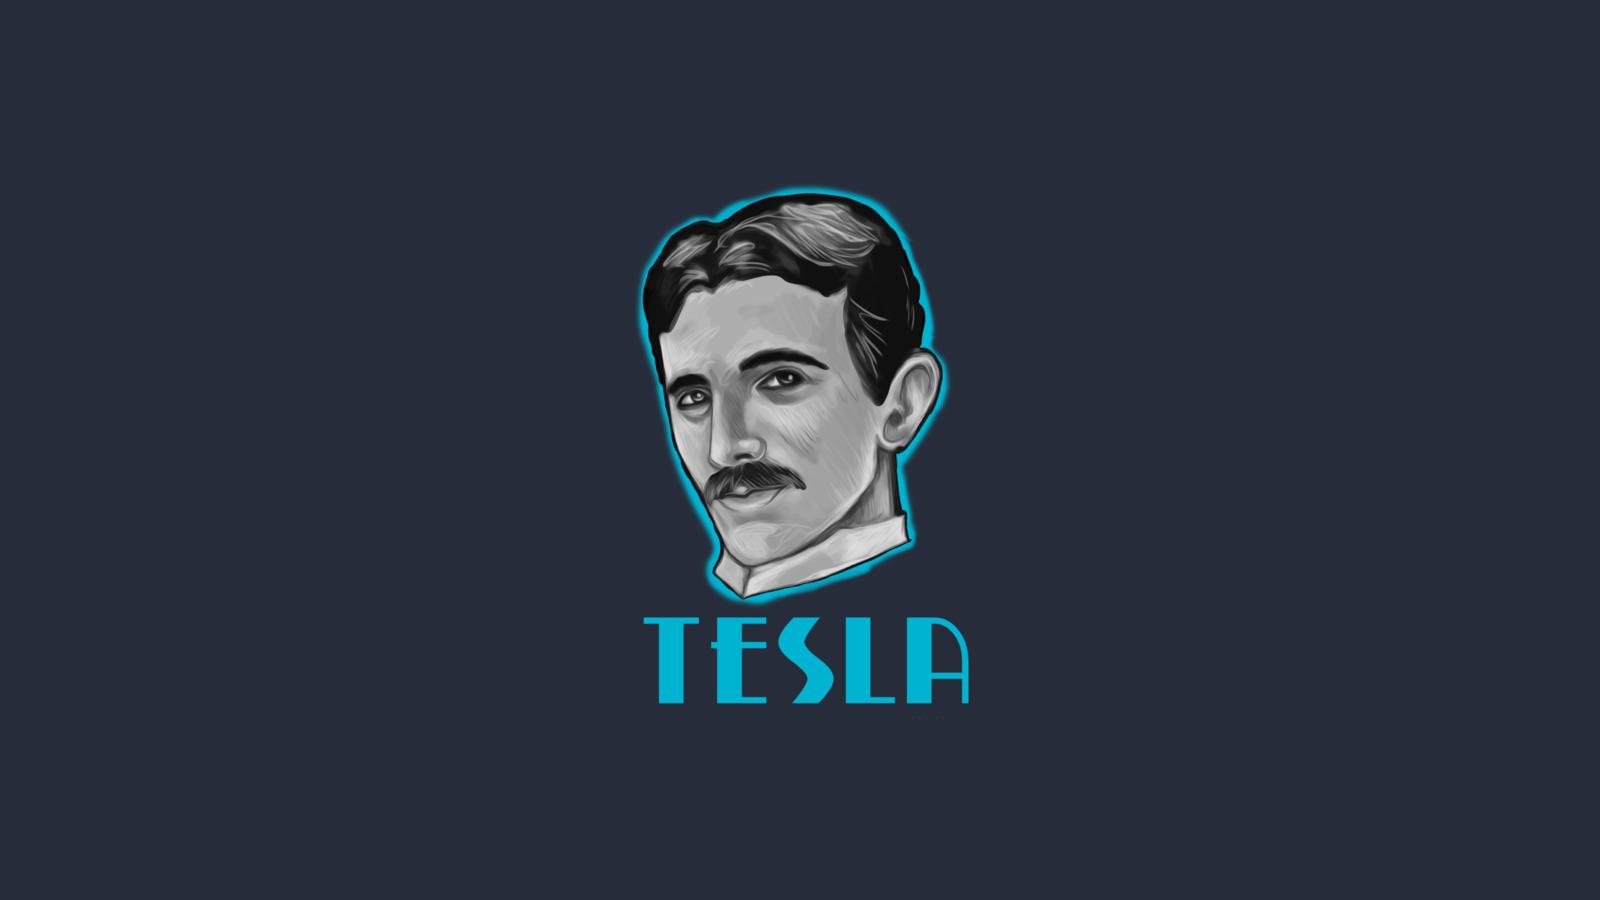 Fondos De Pantalla Nikola Tesla Ciencia 1600x900